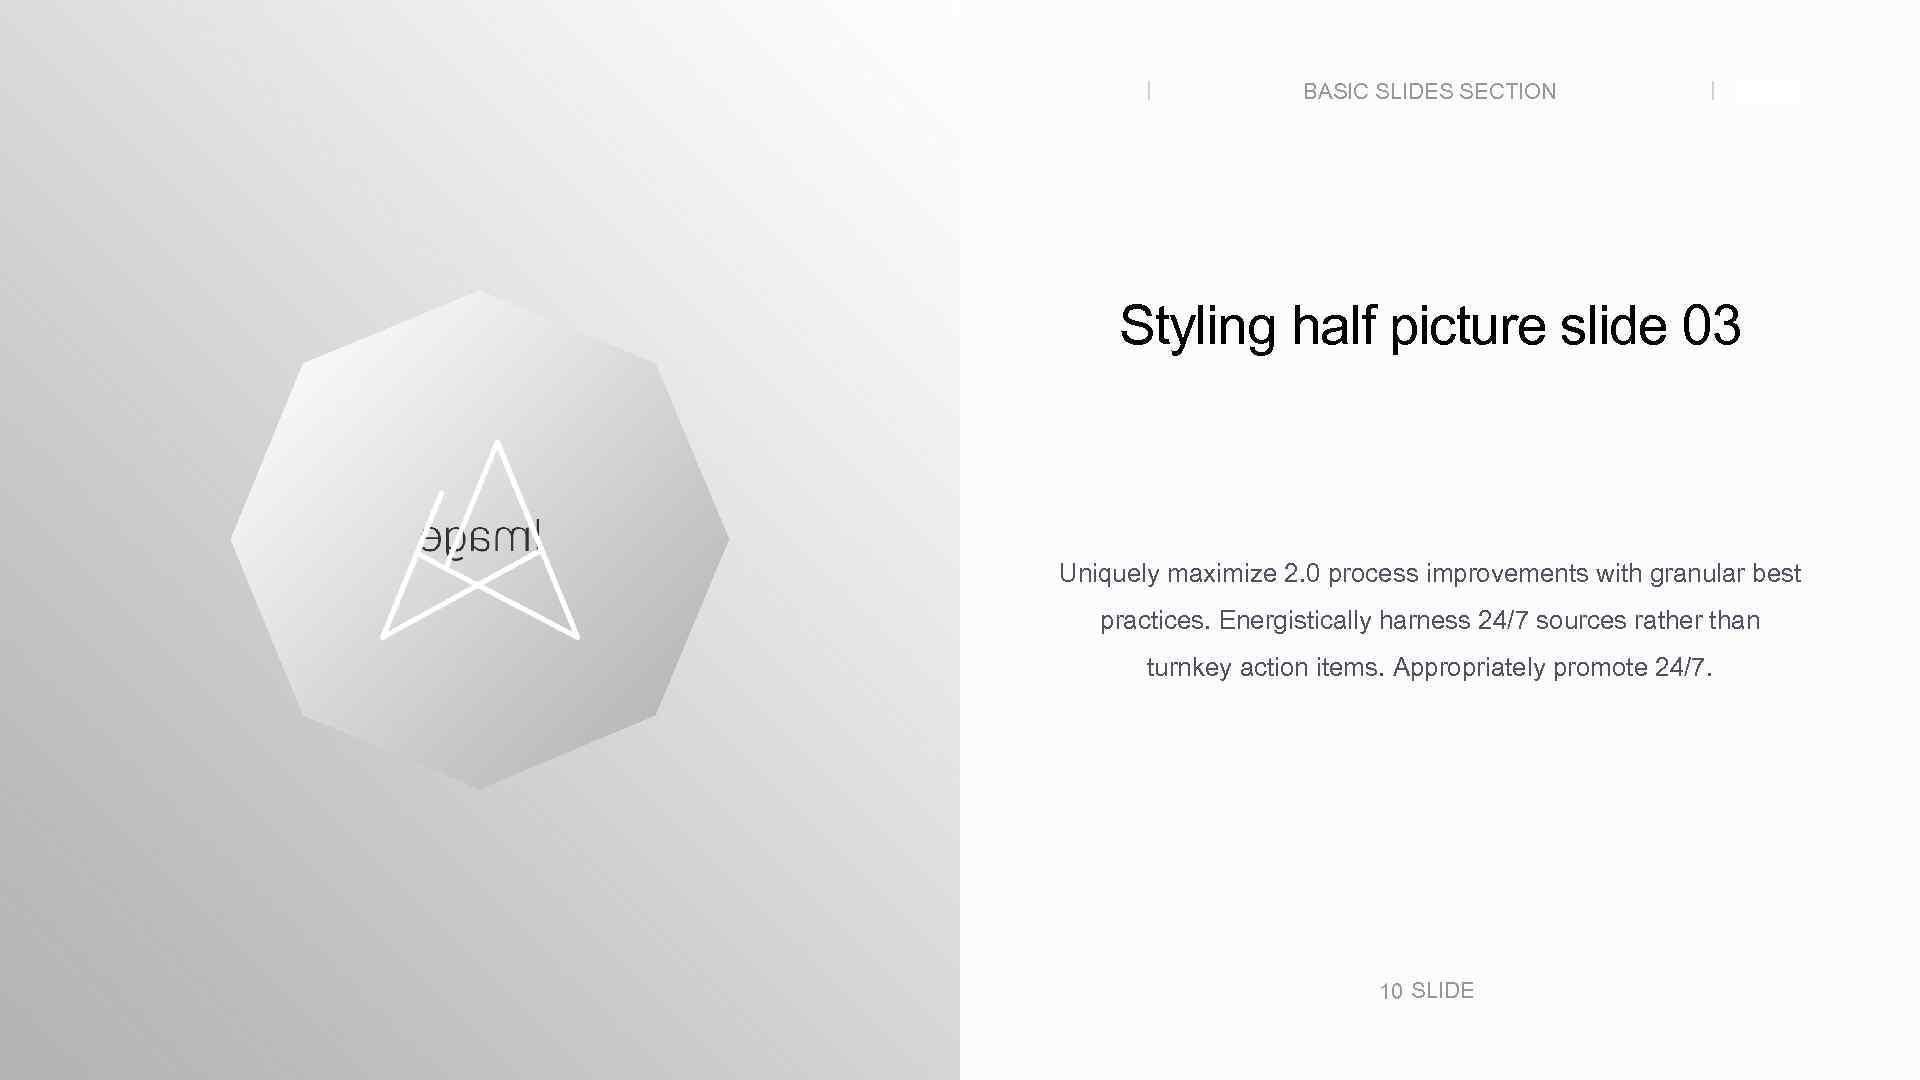 BASIC SLIDES SECTION SLIDE Styling half picture slide 03 Uniquely maximize 2. 0 process